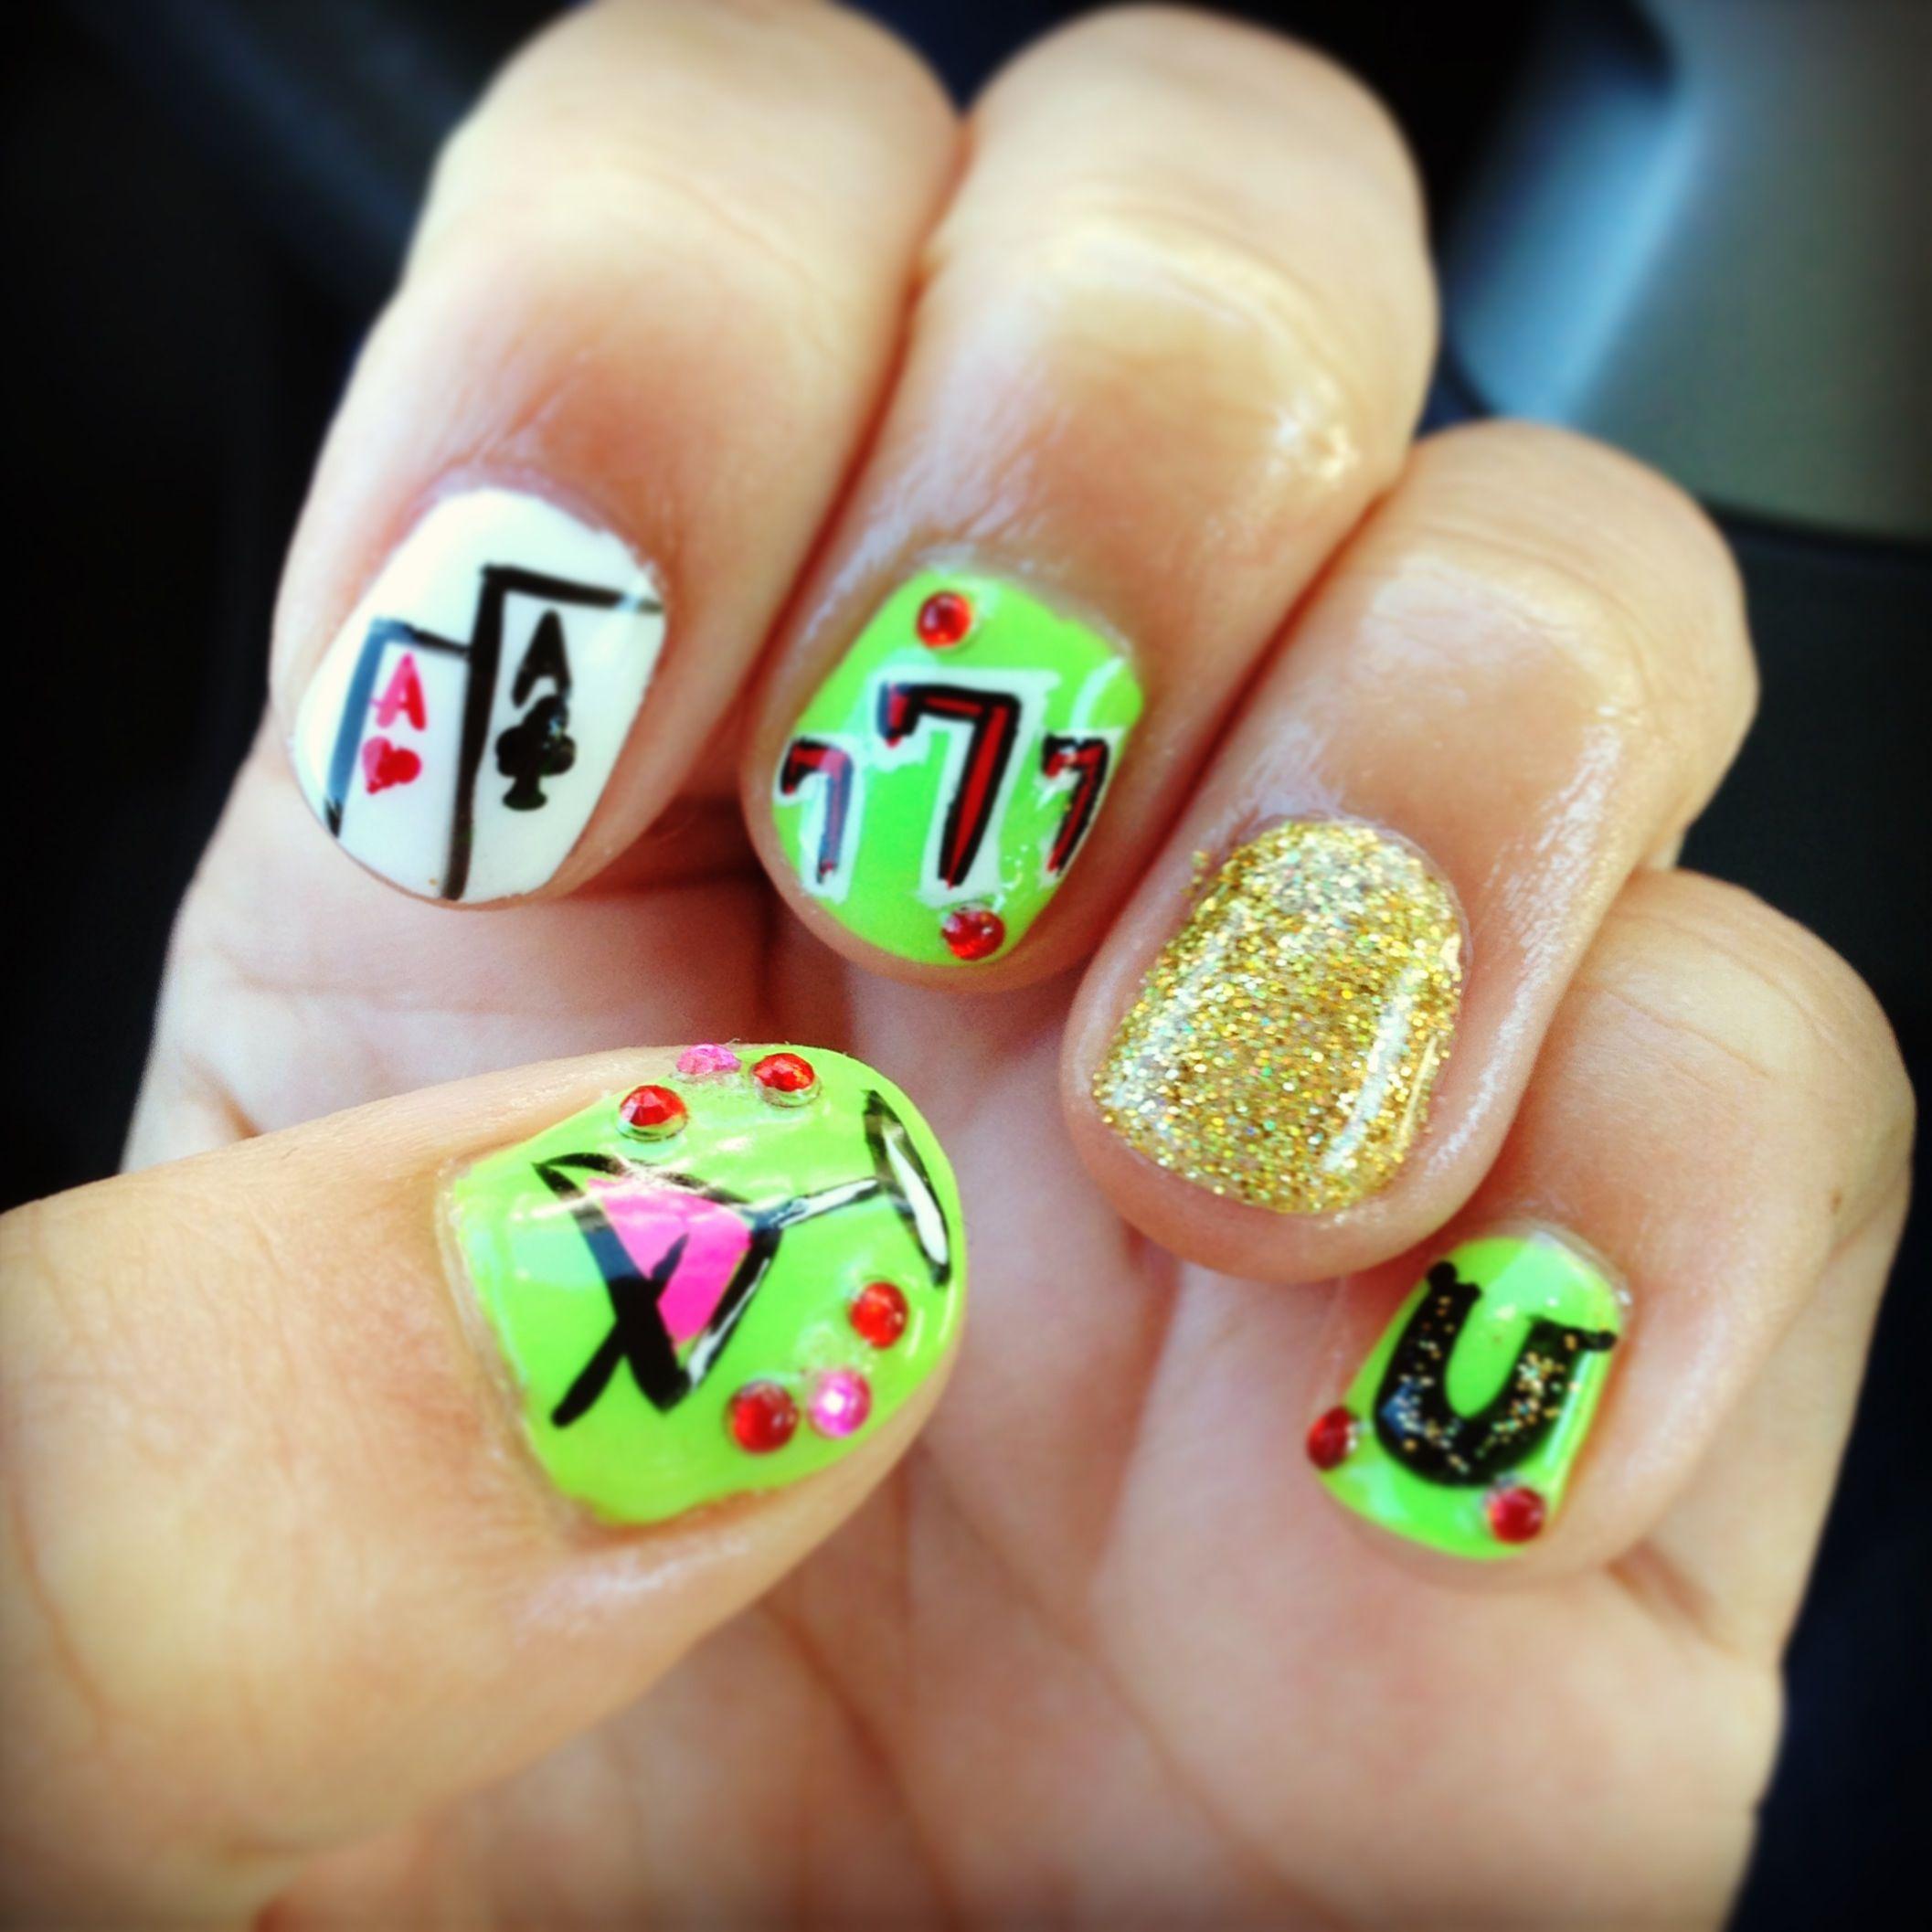 Las Vegas 21st birthday gambling gel polish nail art